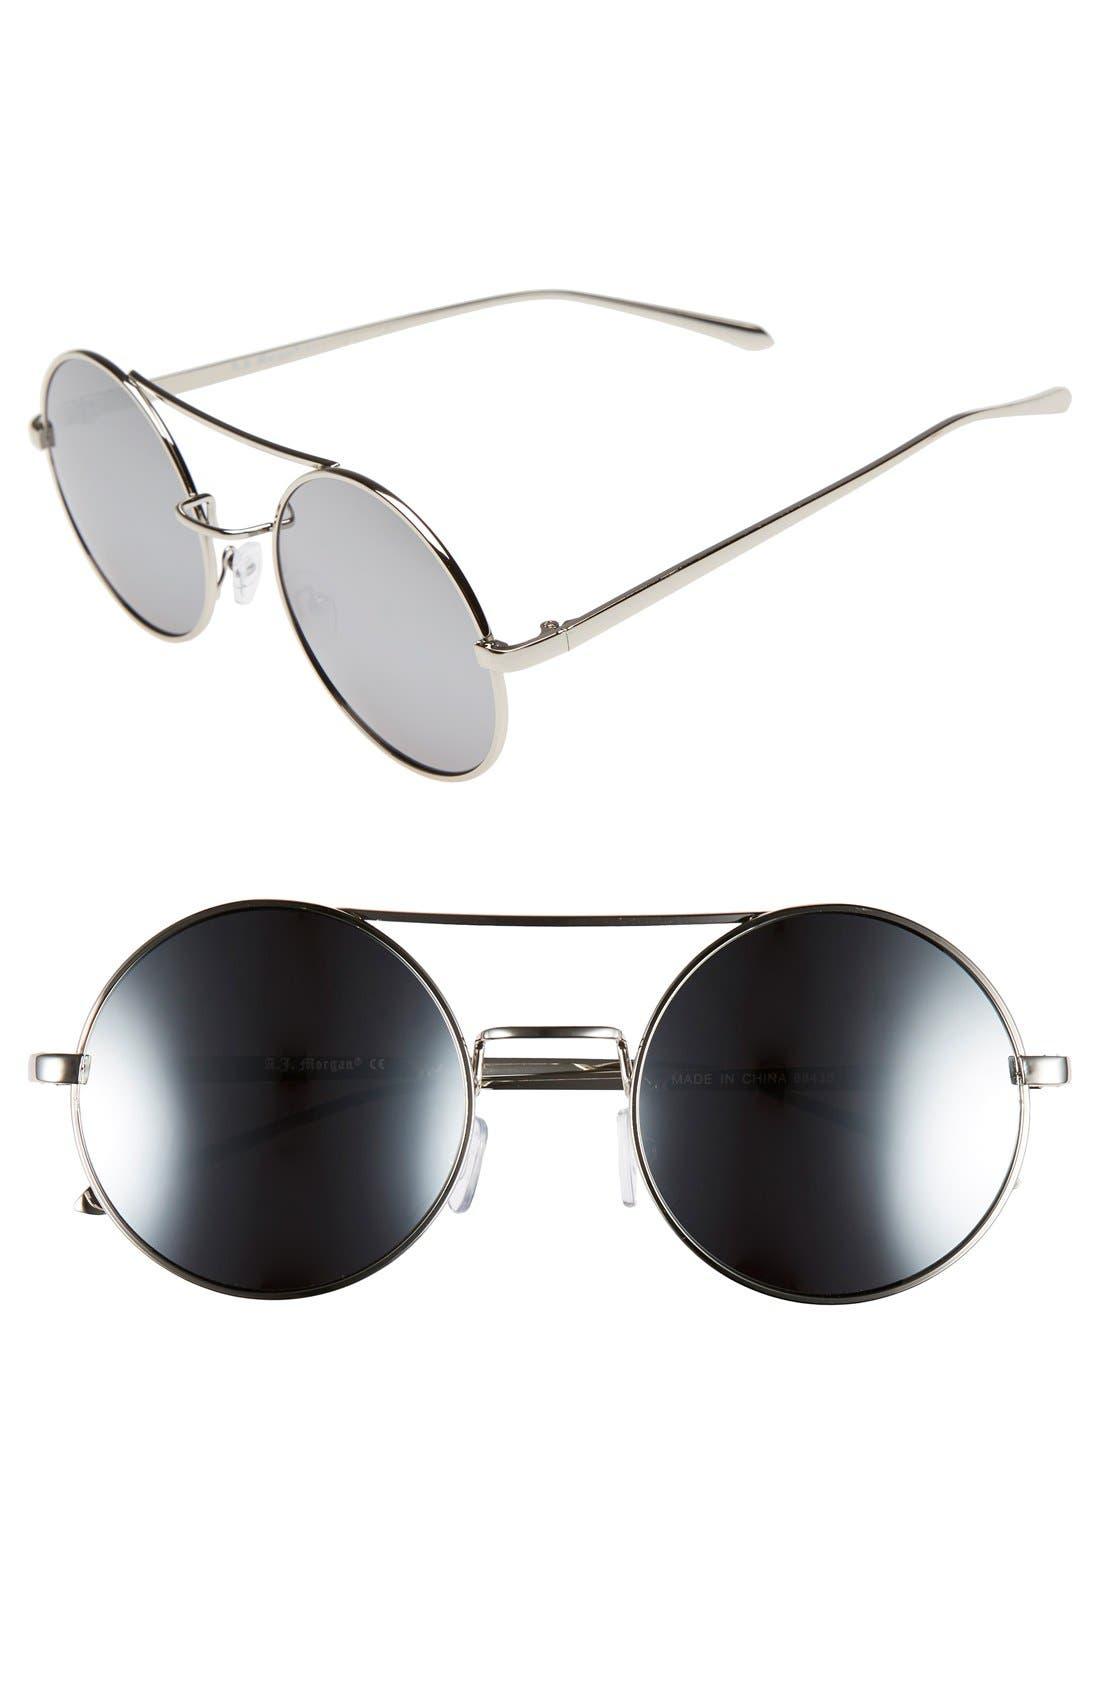 Main Image - A.J. Morgan 'Eclipse' 54mm Round Mirror Lens Sunglasses